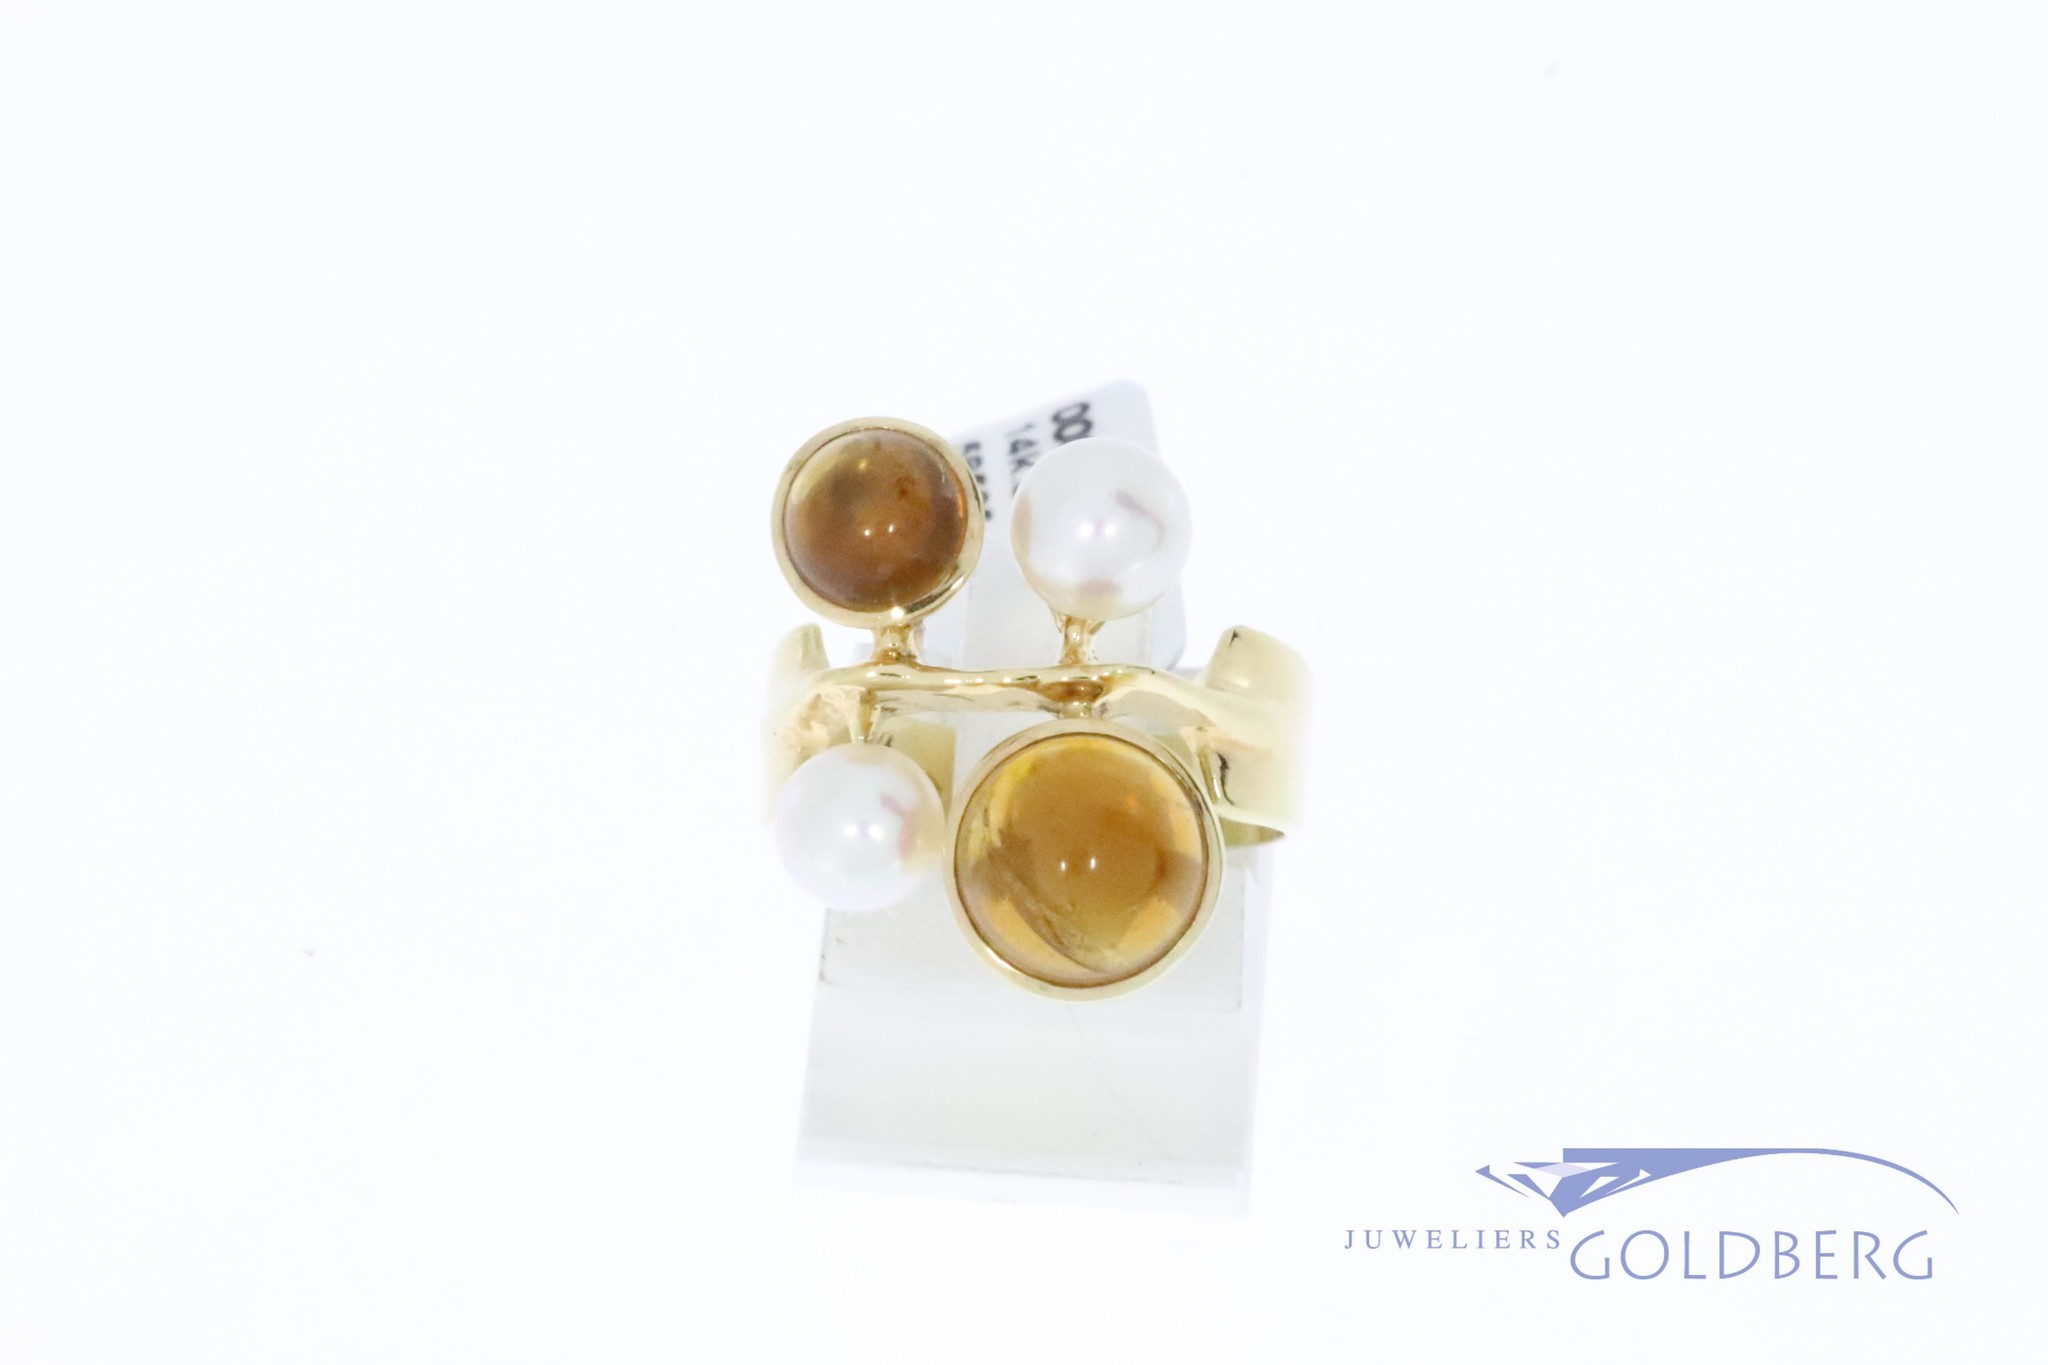 14k gouden vintage ring met barnsteen en parel